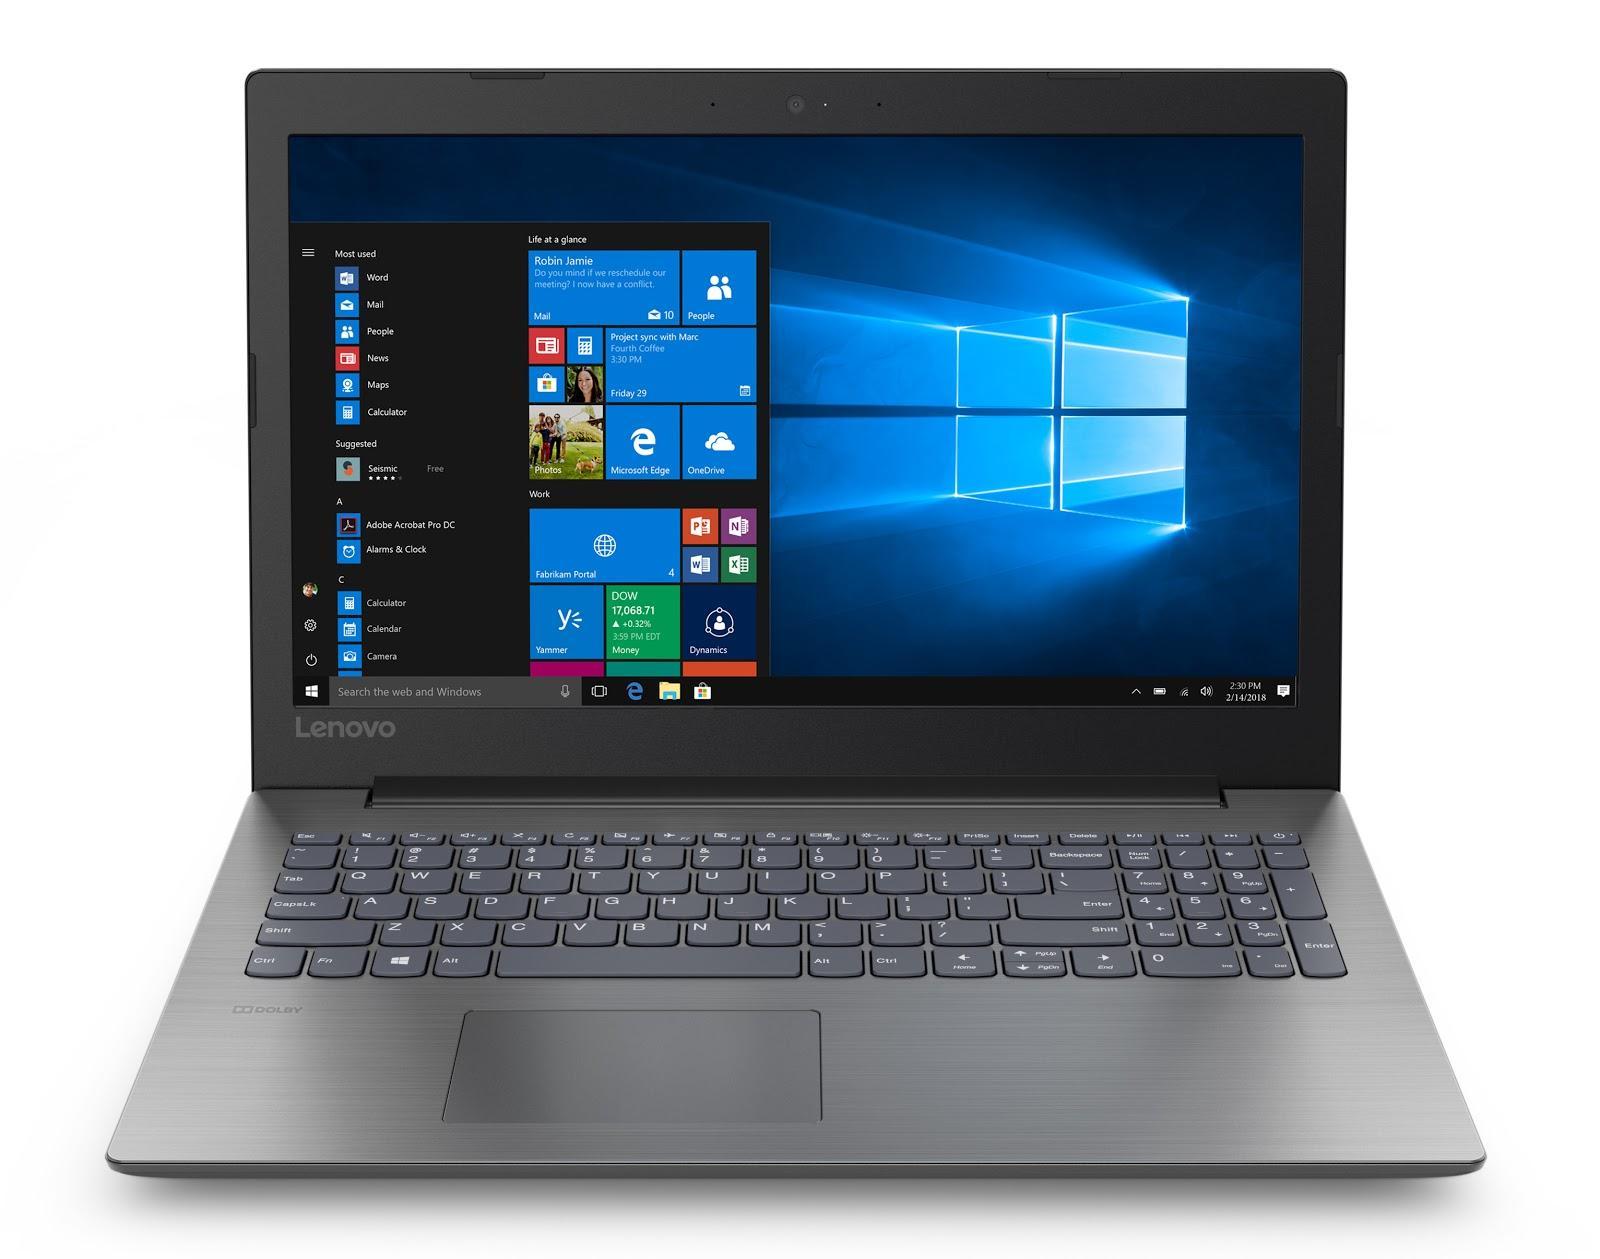 Фото 4. Ноутбук Lenovo ideapad 330-15 Onyx Black (81DE01VSRA)